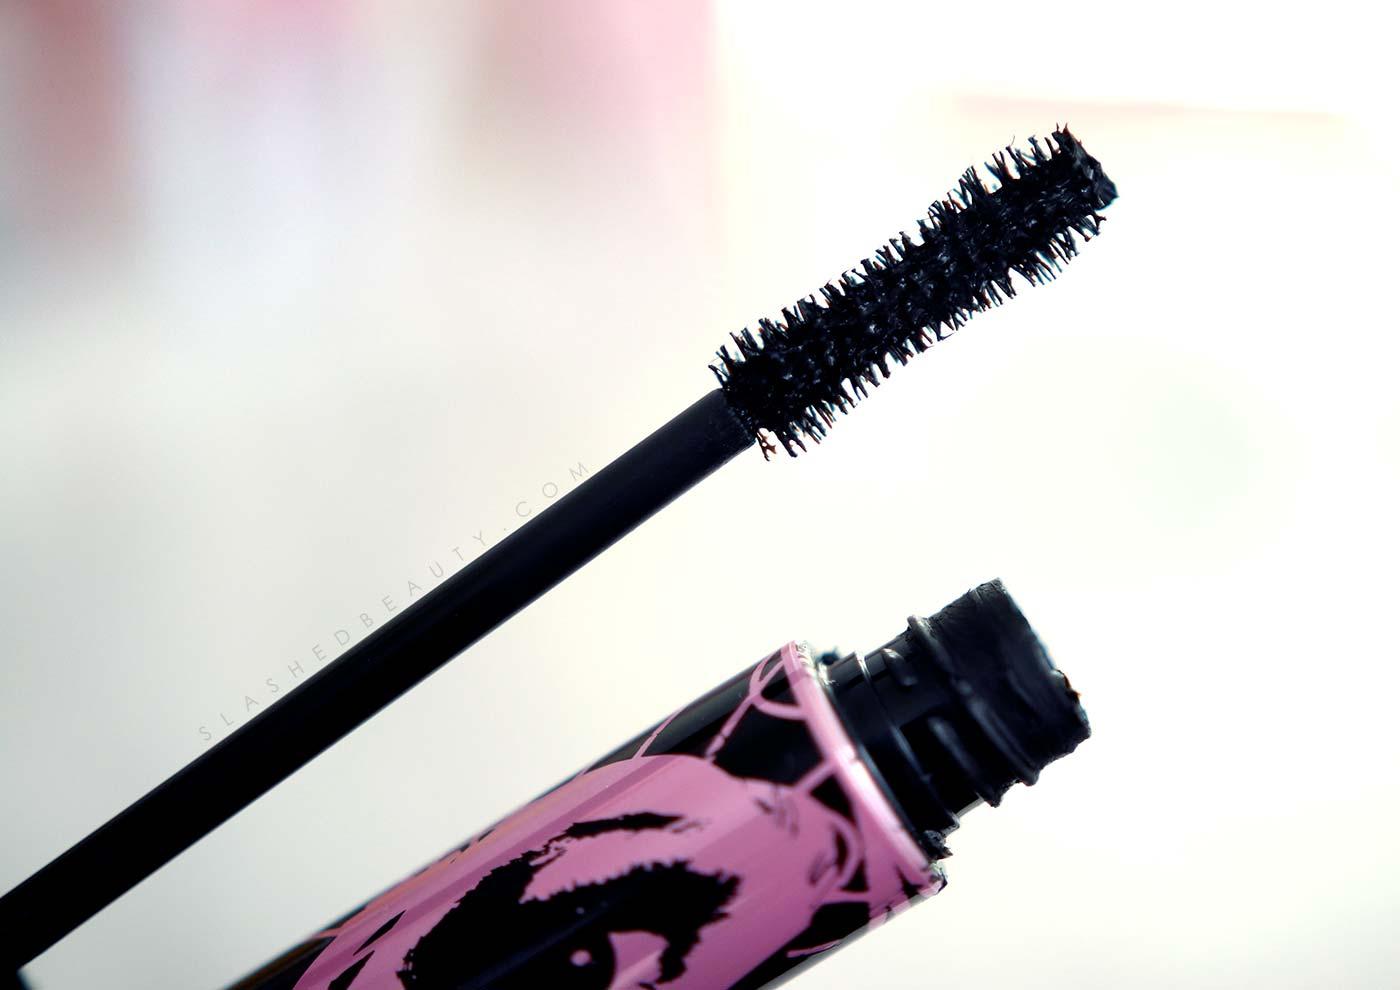 Flower Beauty Warrior Princess Mascara Brush   New Pick for Best Drugstore Mascara   Slashed Beauty